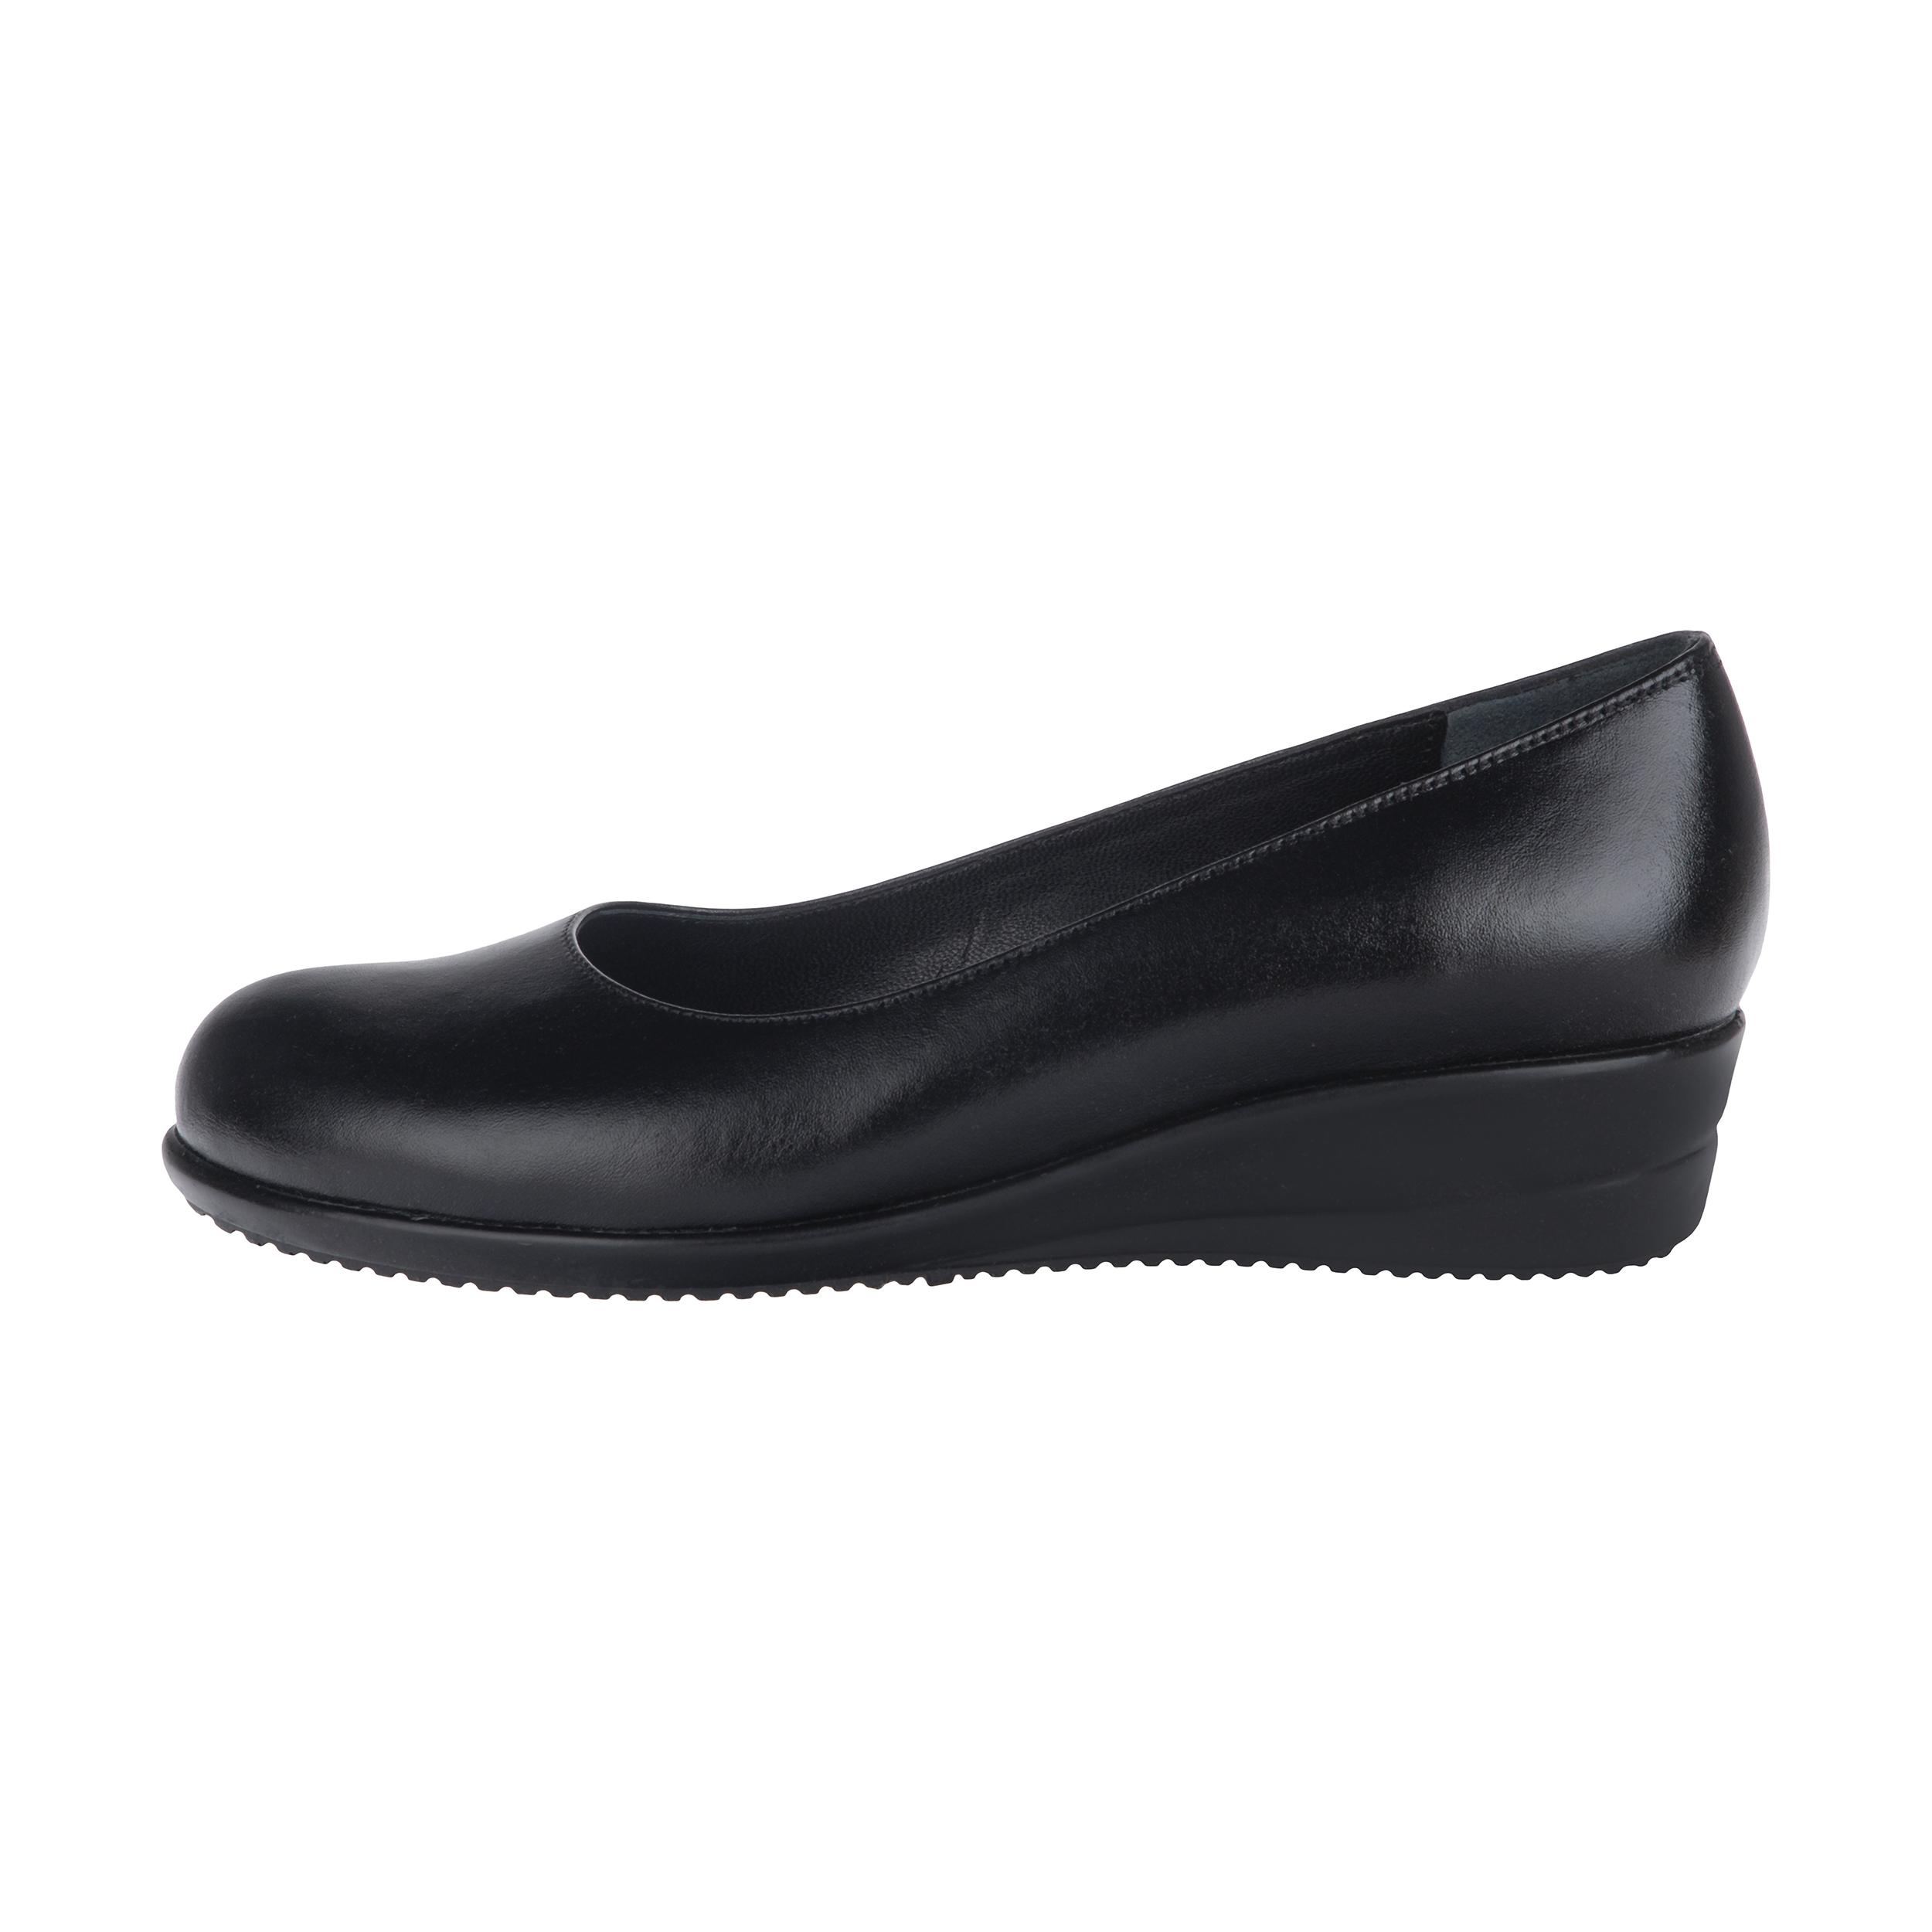 کفش روزمره زنانه شیفر مدل 5292D500101